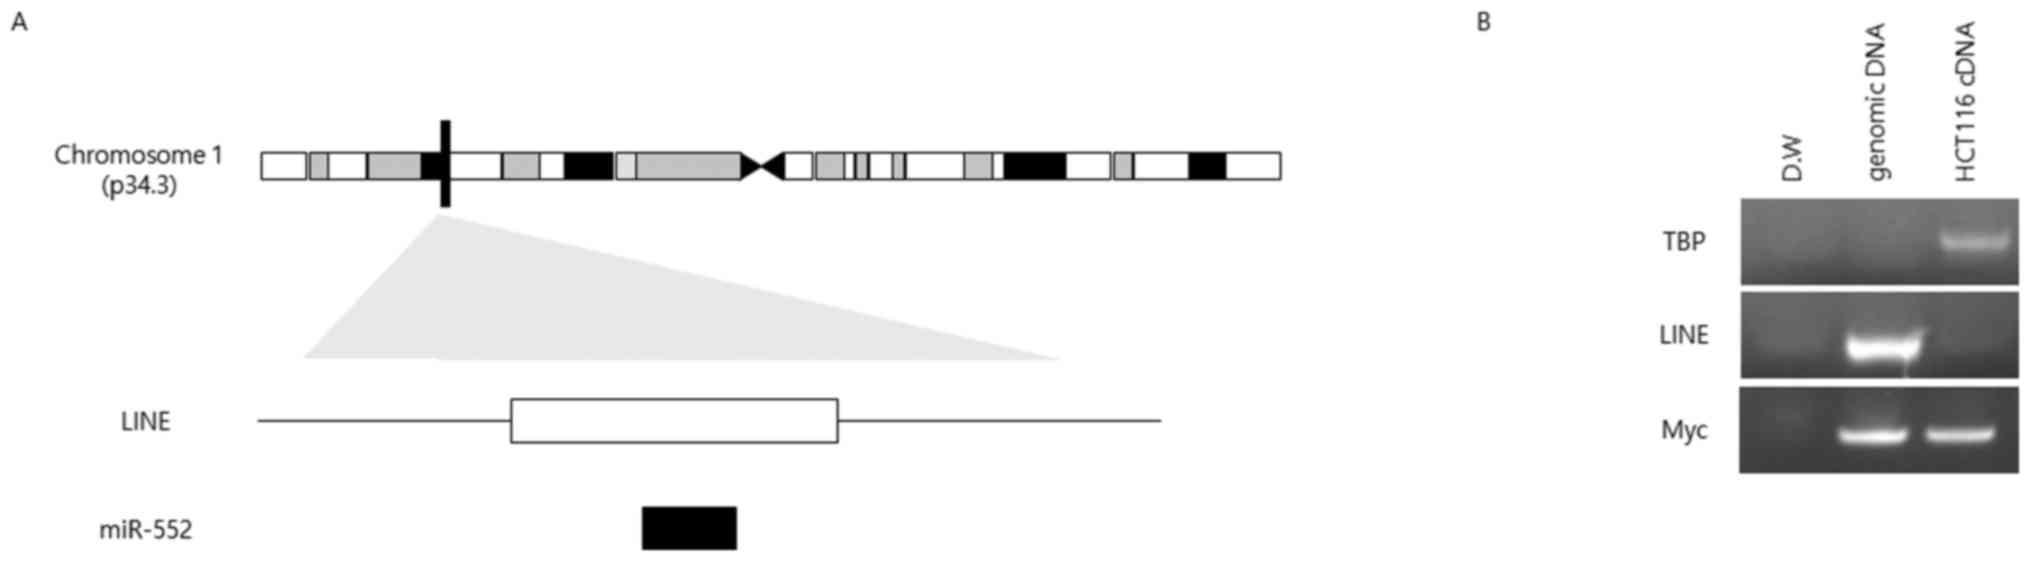 MicroRNA-552 links Wnt signaling to p53 tumor suppressor in